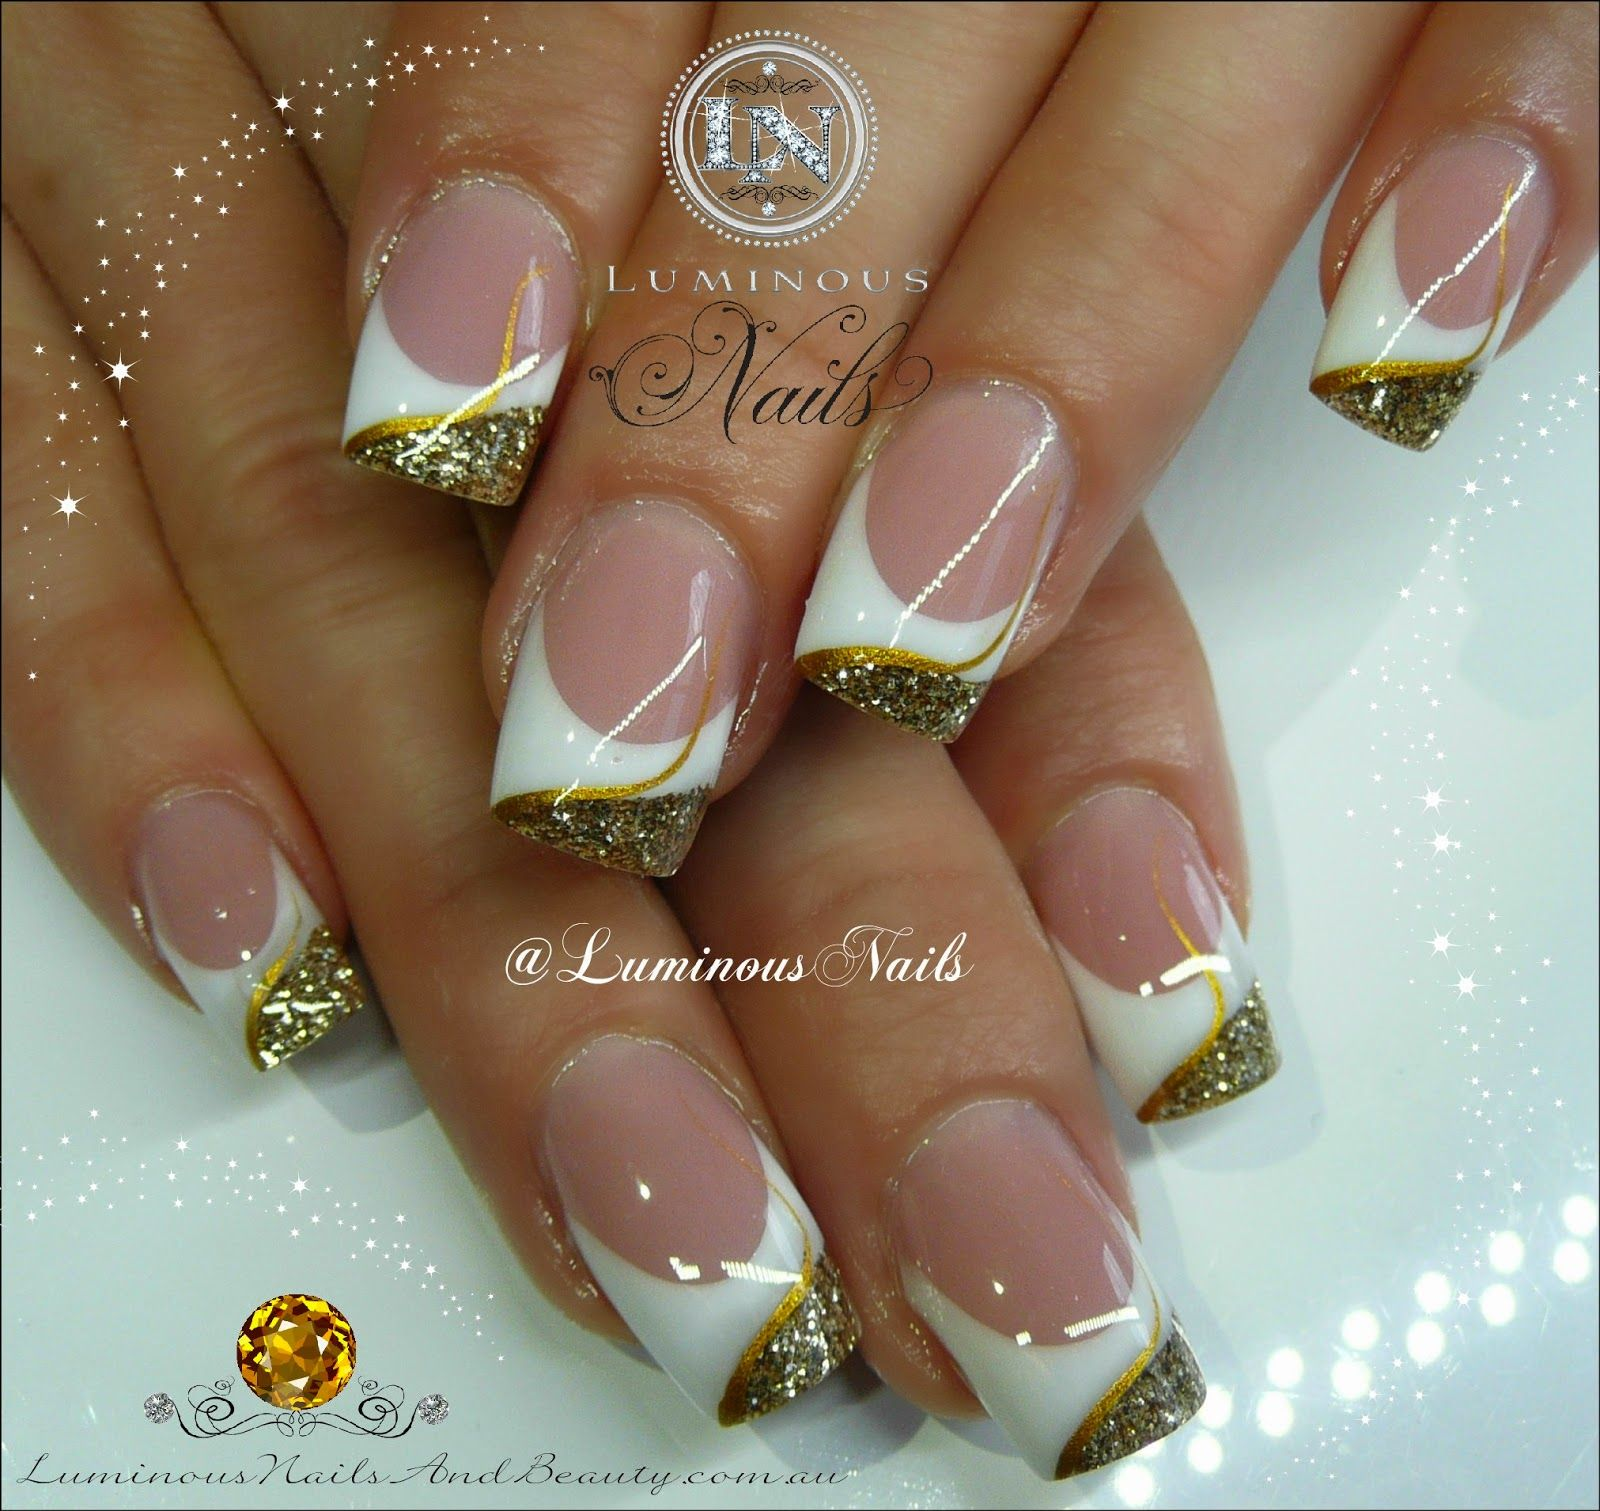 Luminous nails white gold acrylic nails nails pinterest luminous nails white gold acrylic nails prinsesfo Choice Image